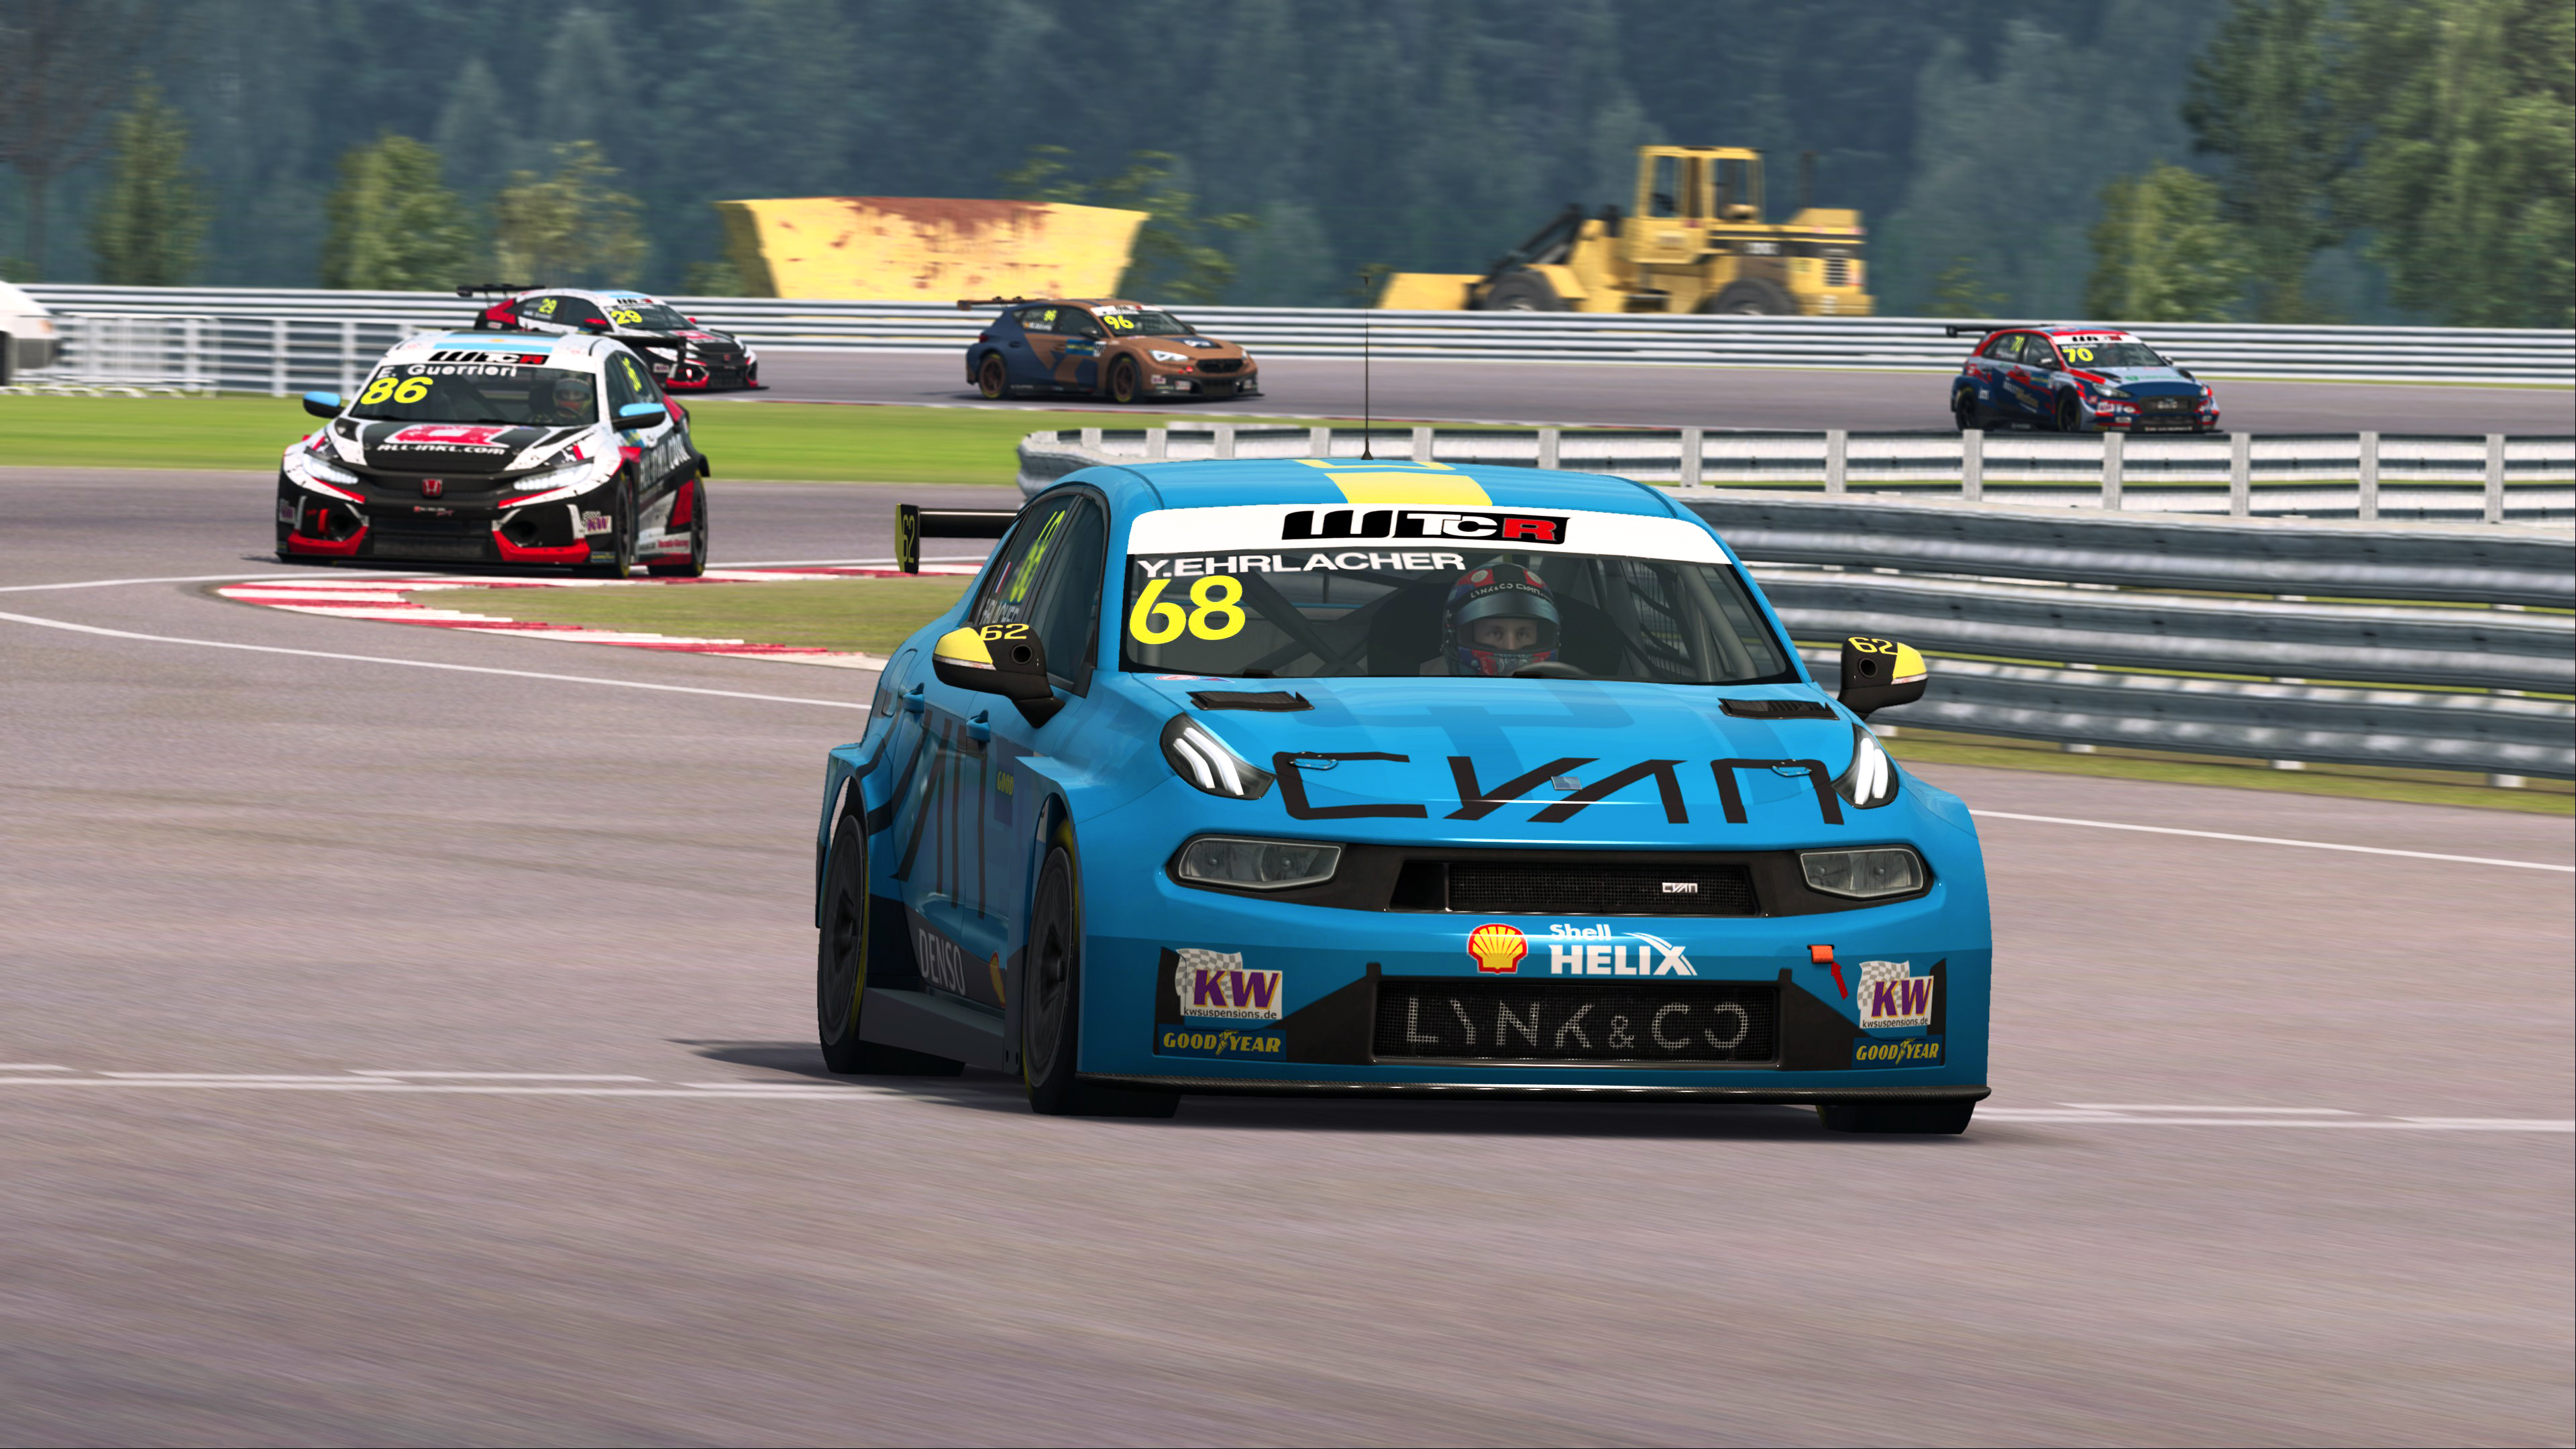 04-yann-ehrlacher-wins-race-1.jpg